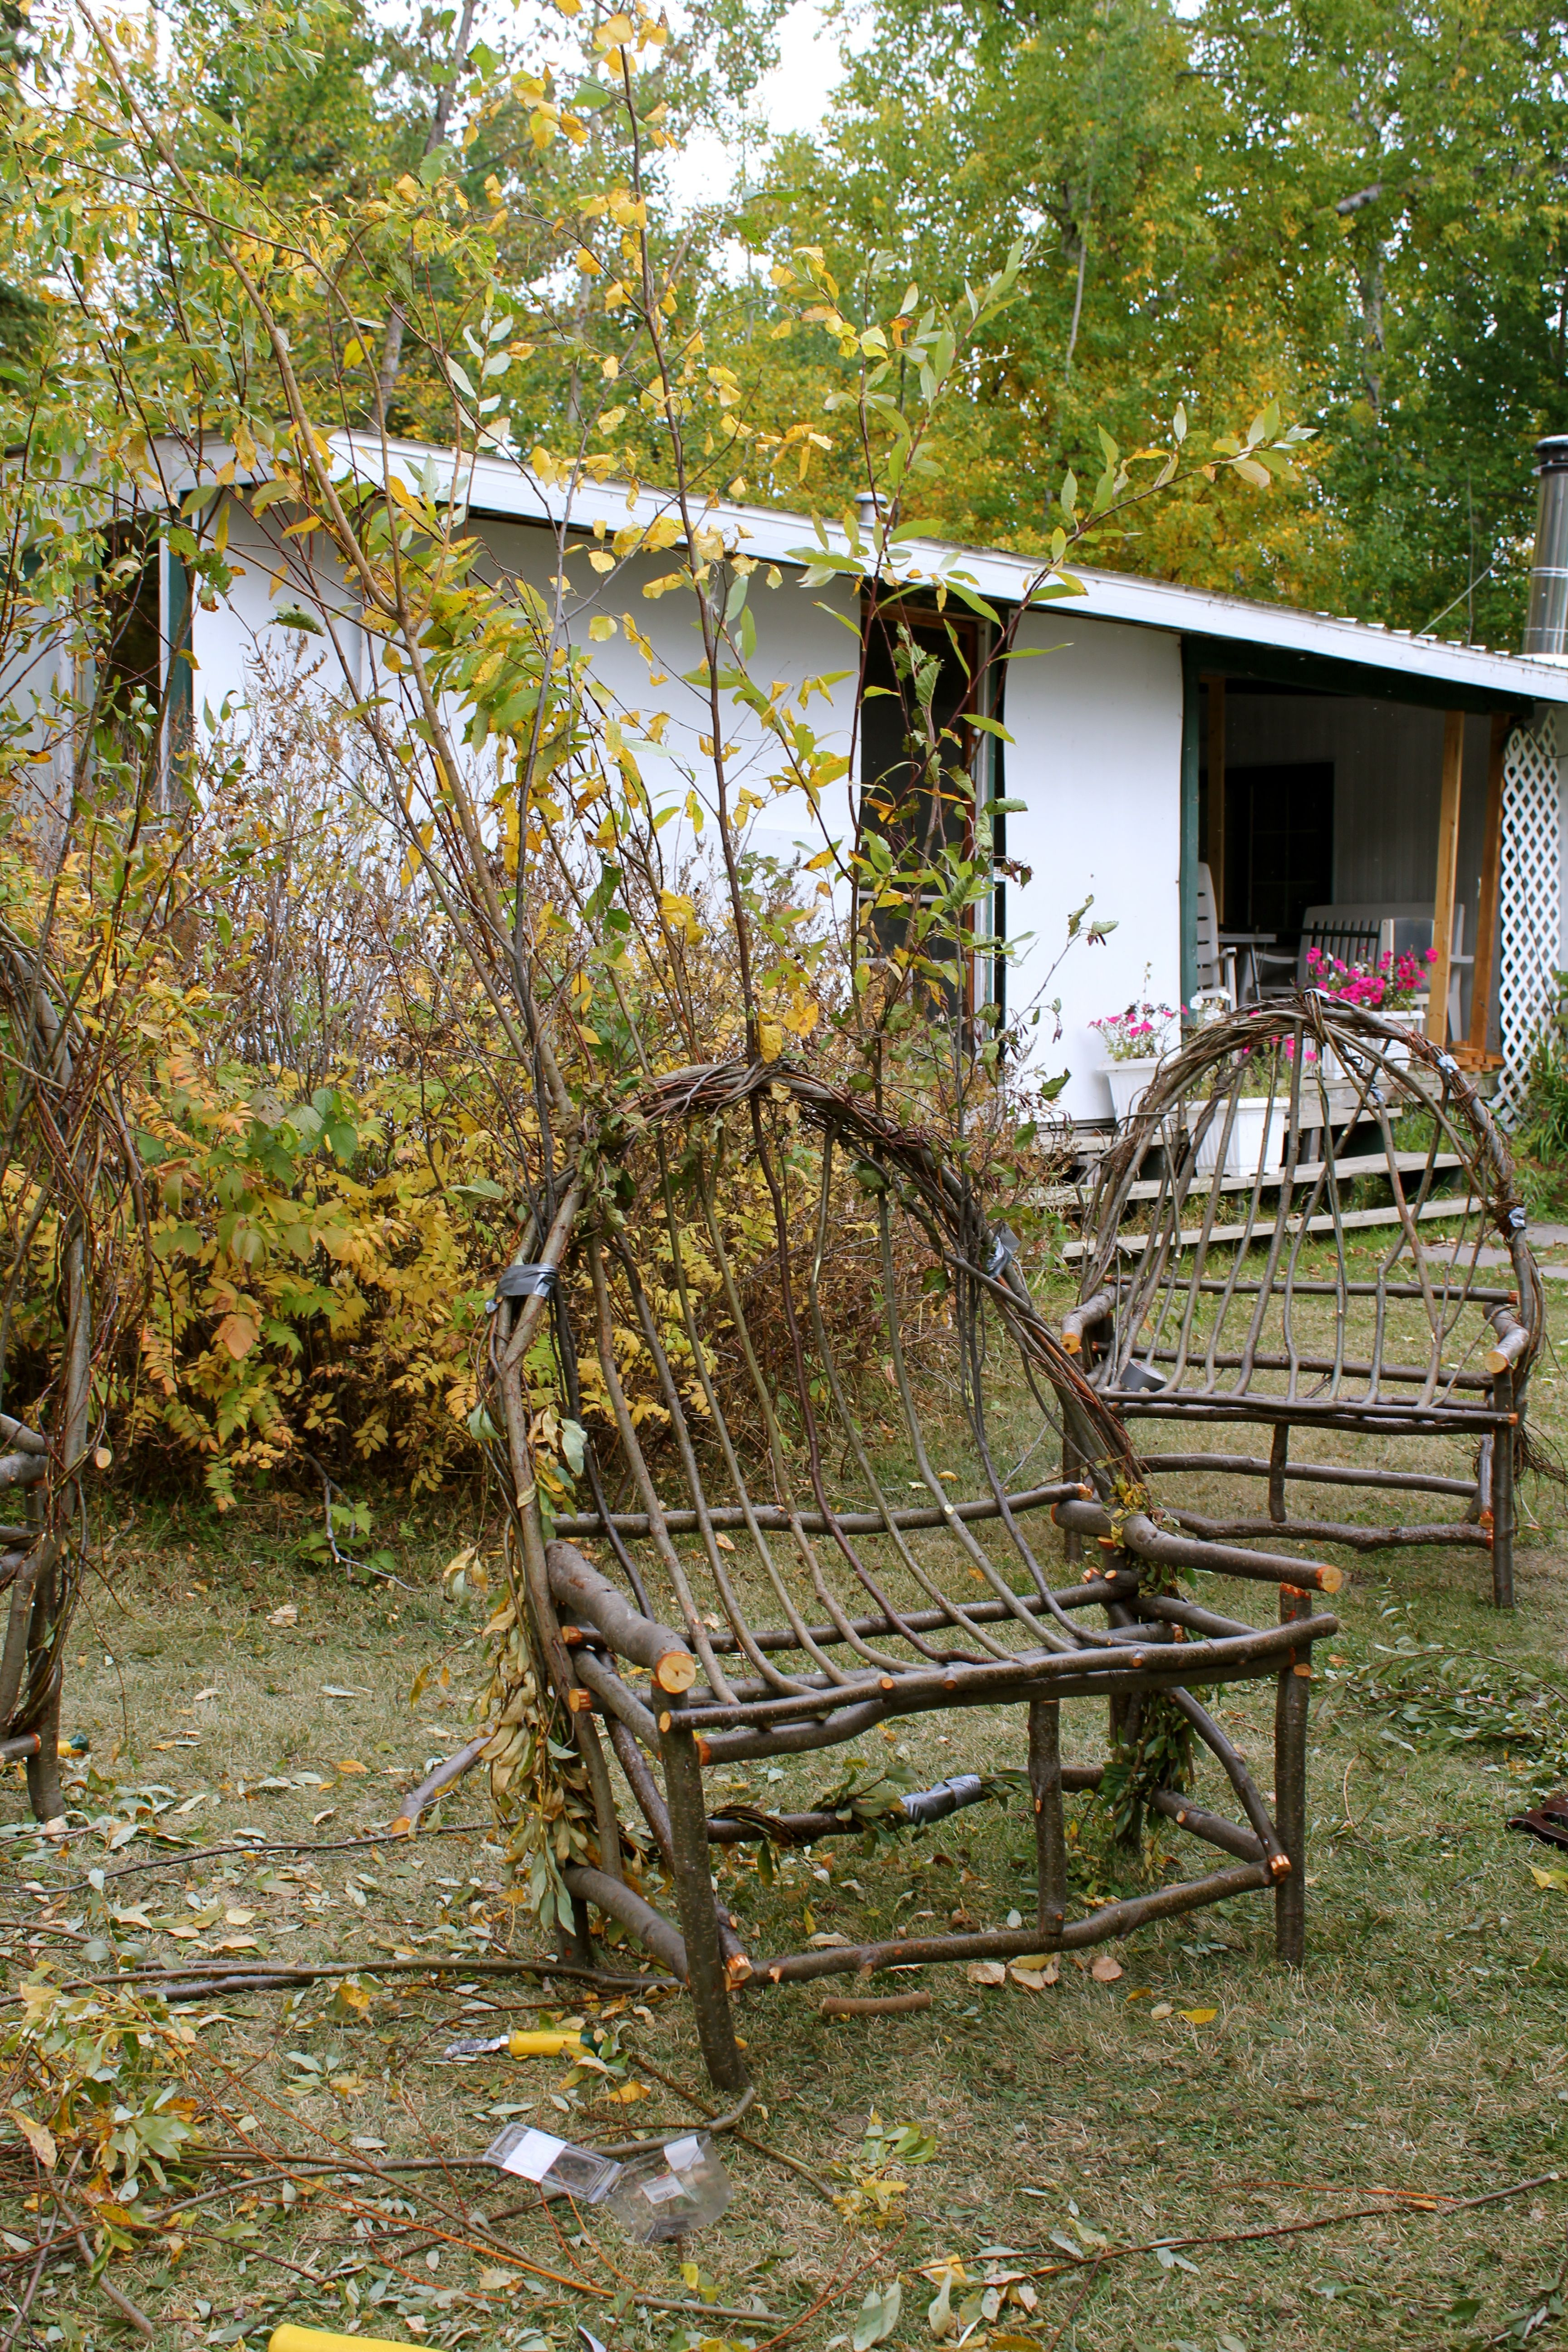 Bent Willow Furniture Cabinorganic